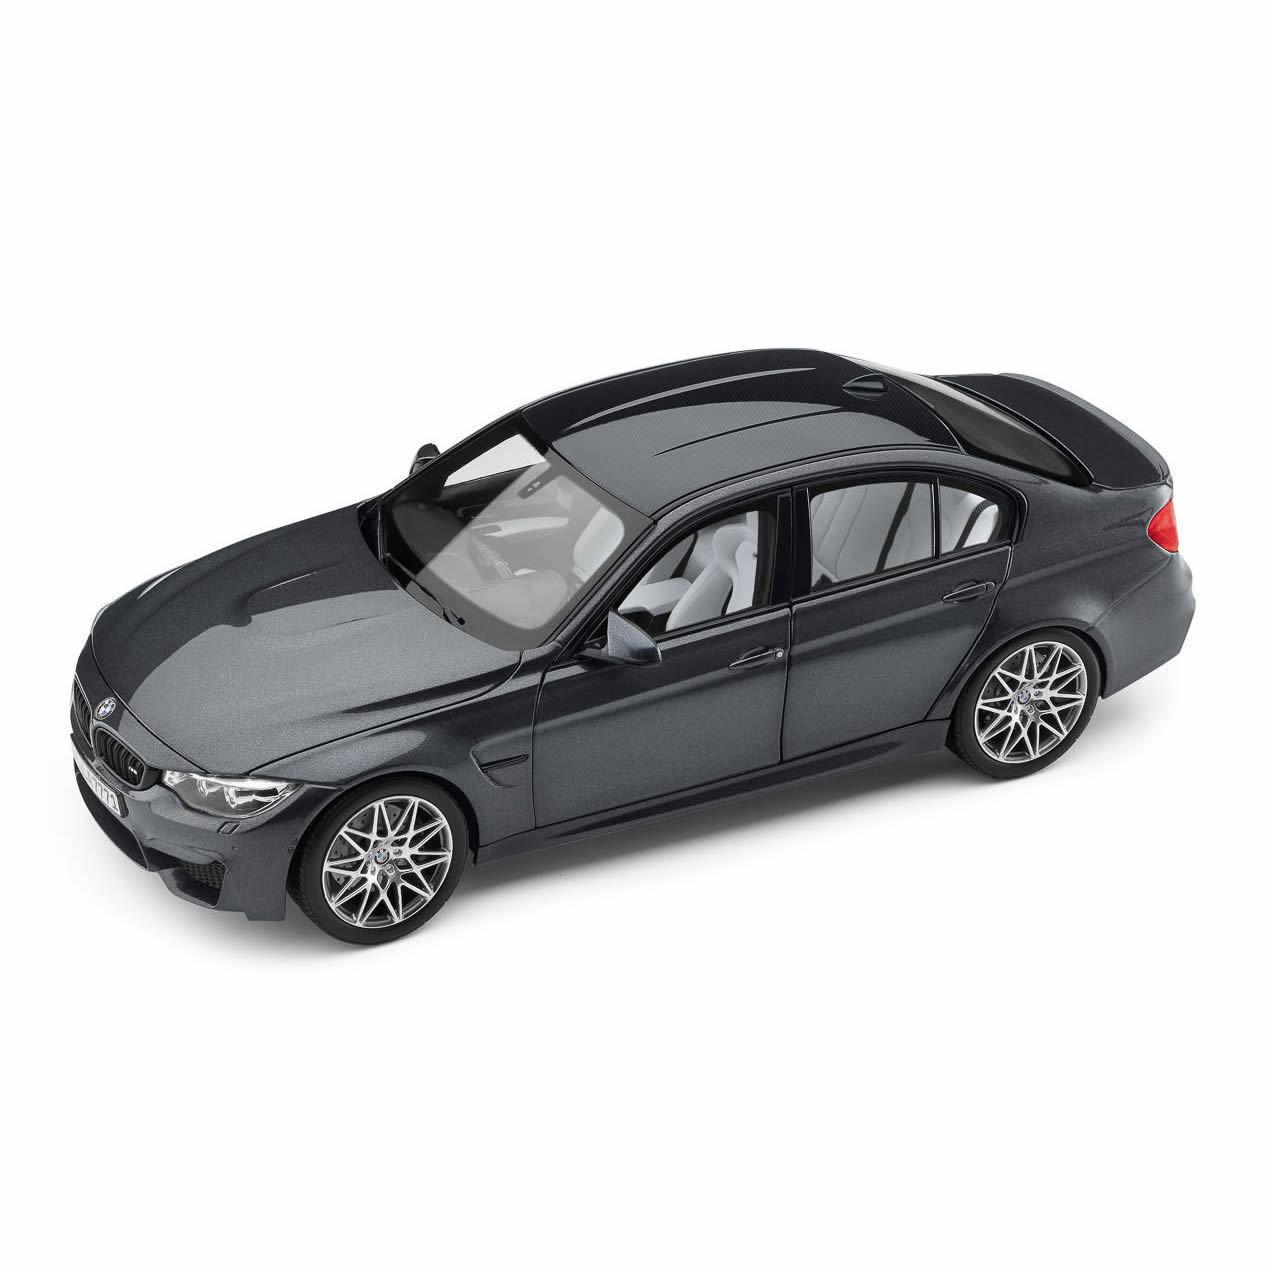 Original Miniatura BMW M3 (F80) 1 18 grigio Modelo Coleccionista Nuevo 80432411554